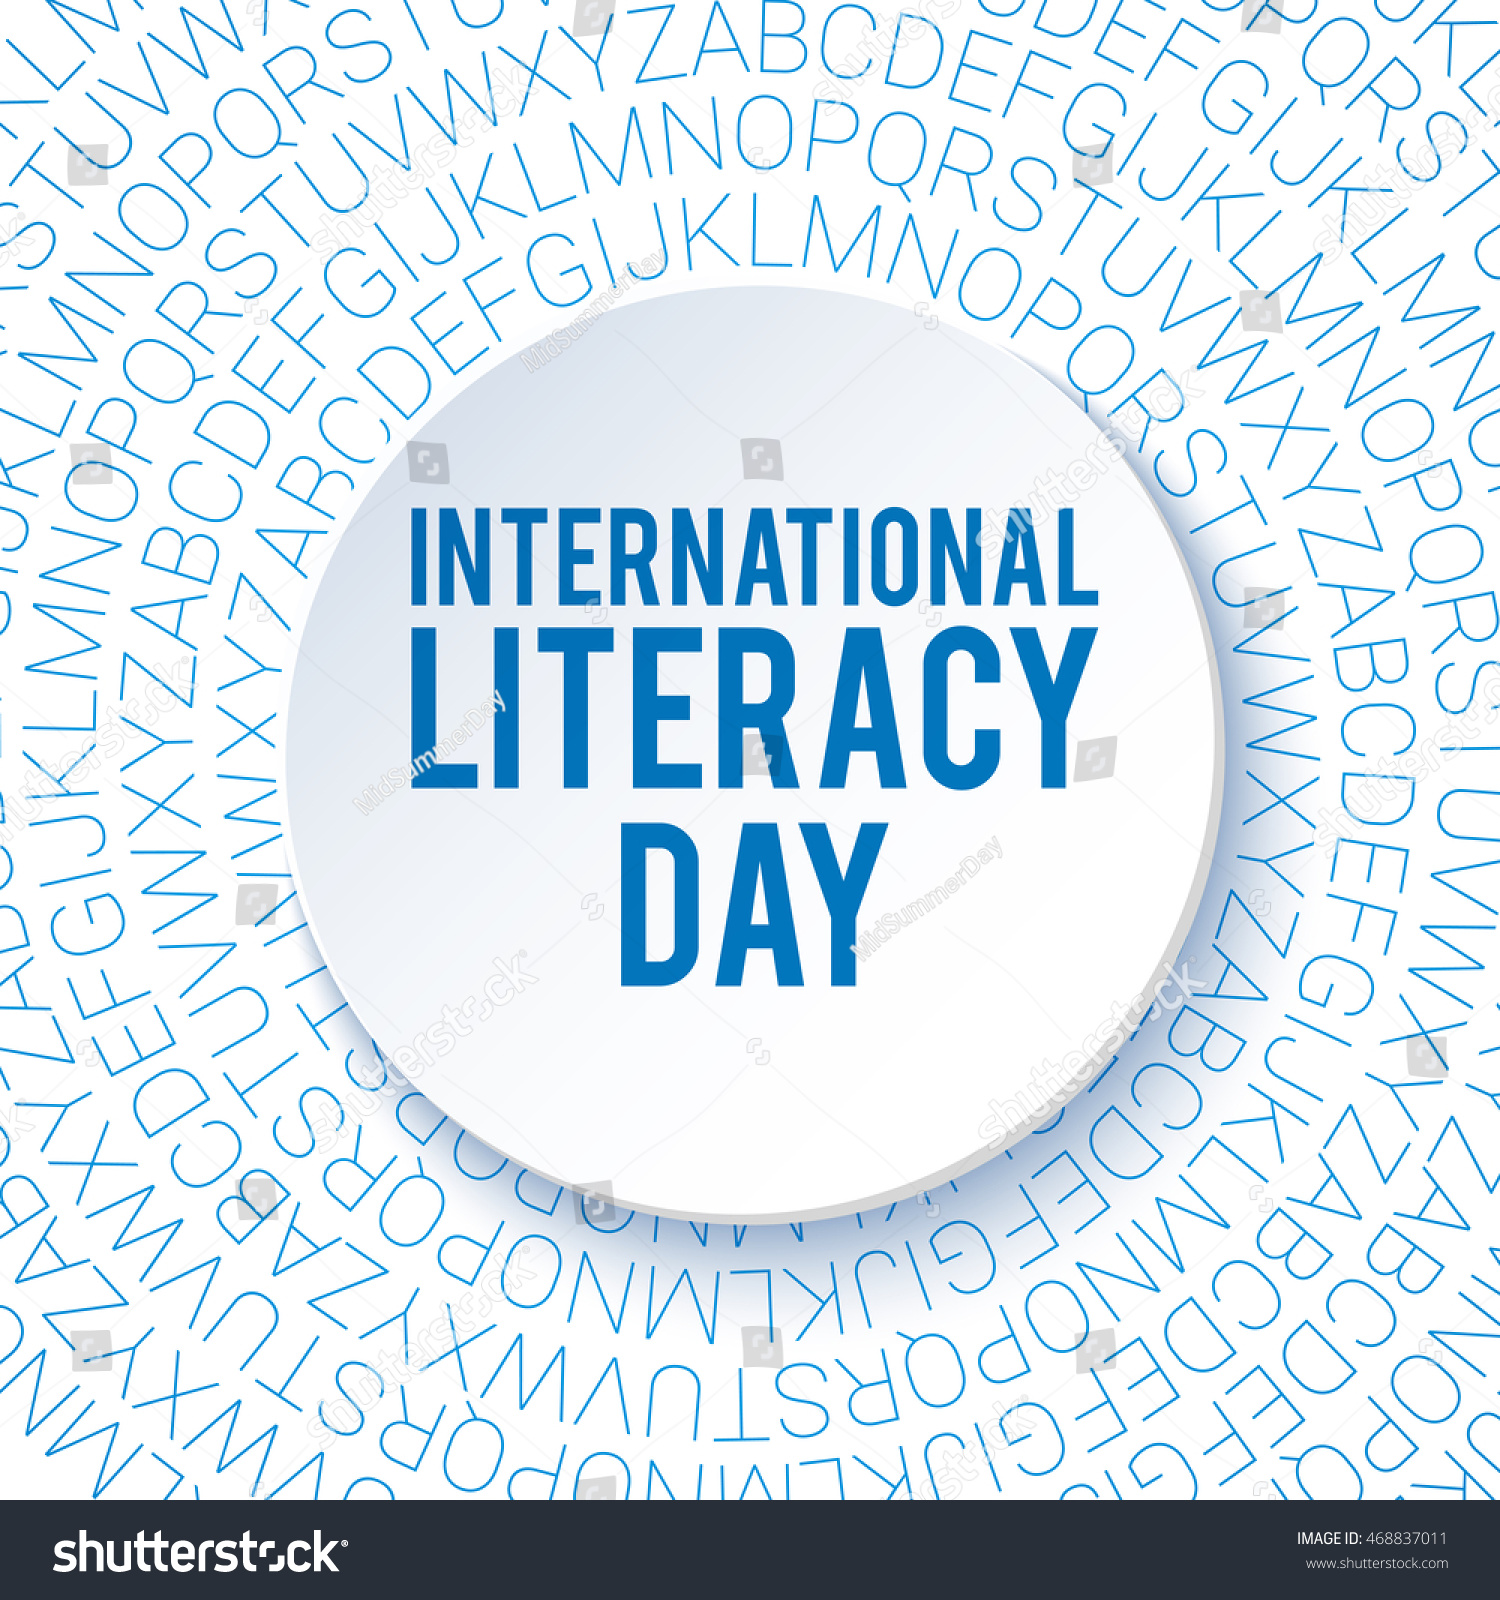 International Literacy Day Background Poster Flyer Stock